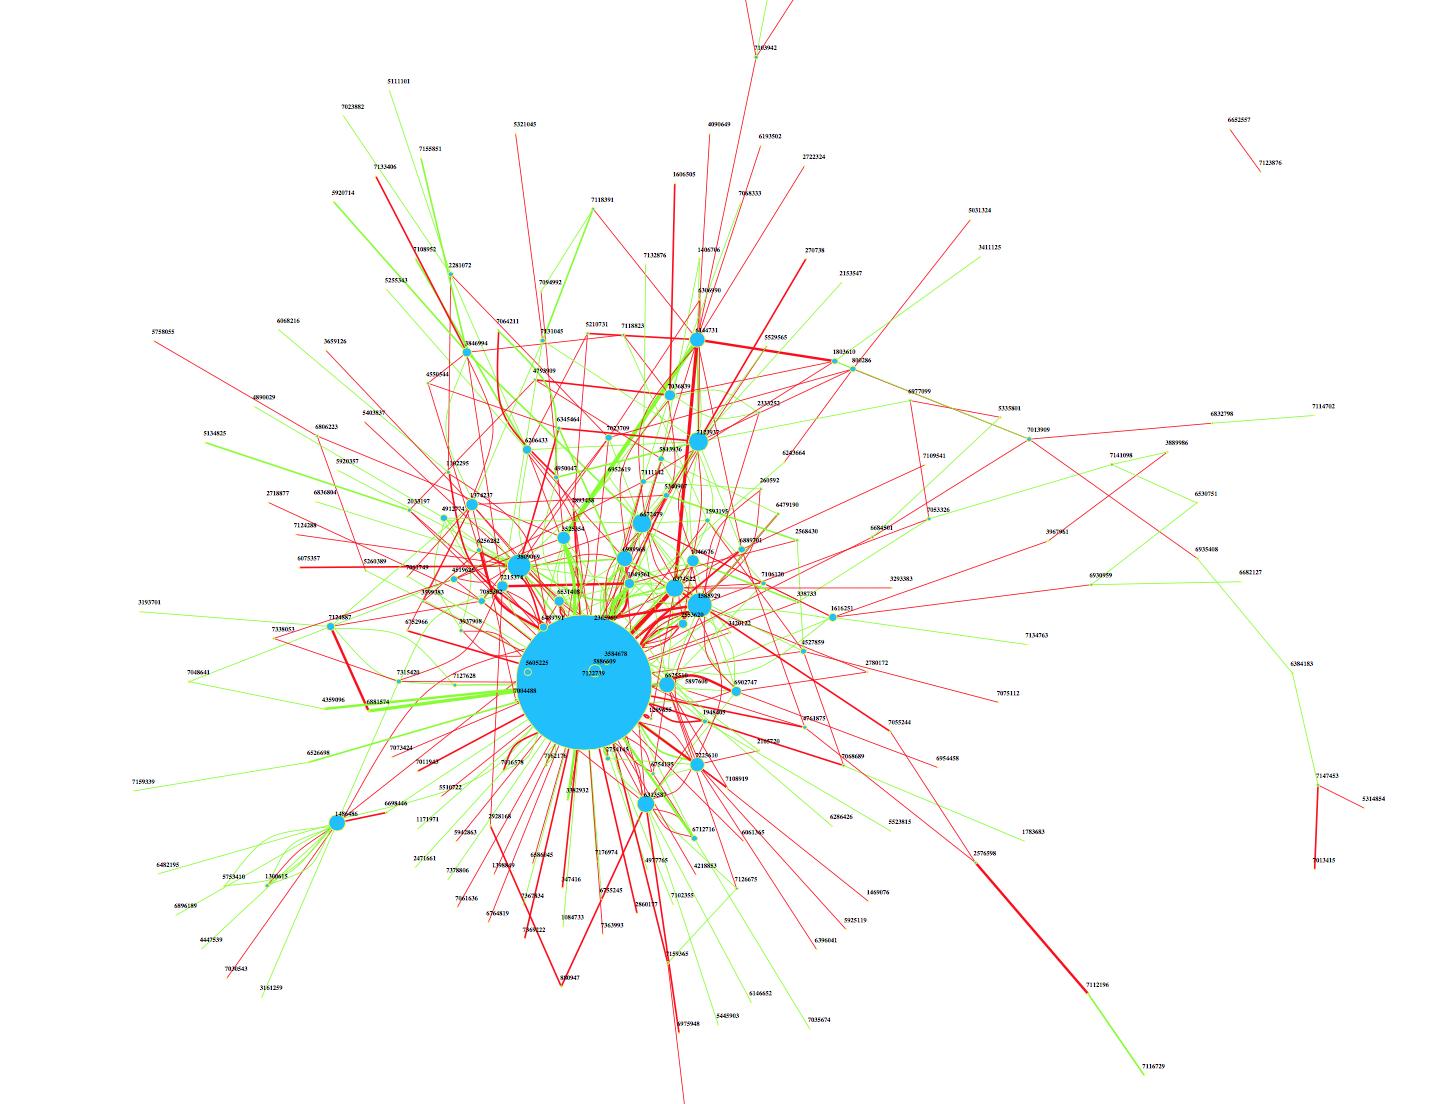 MOOC: Data visualization